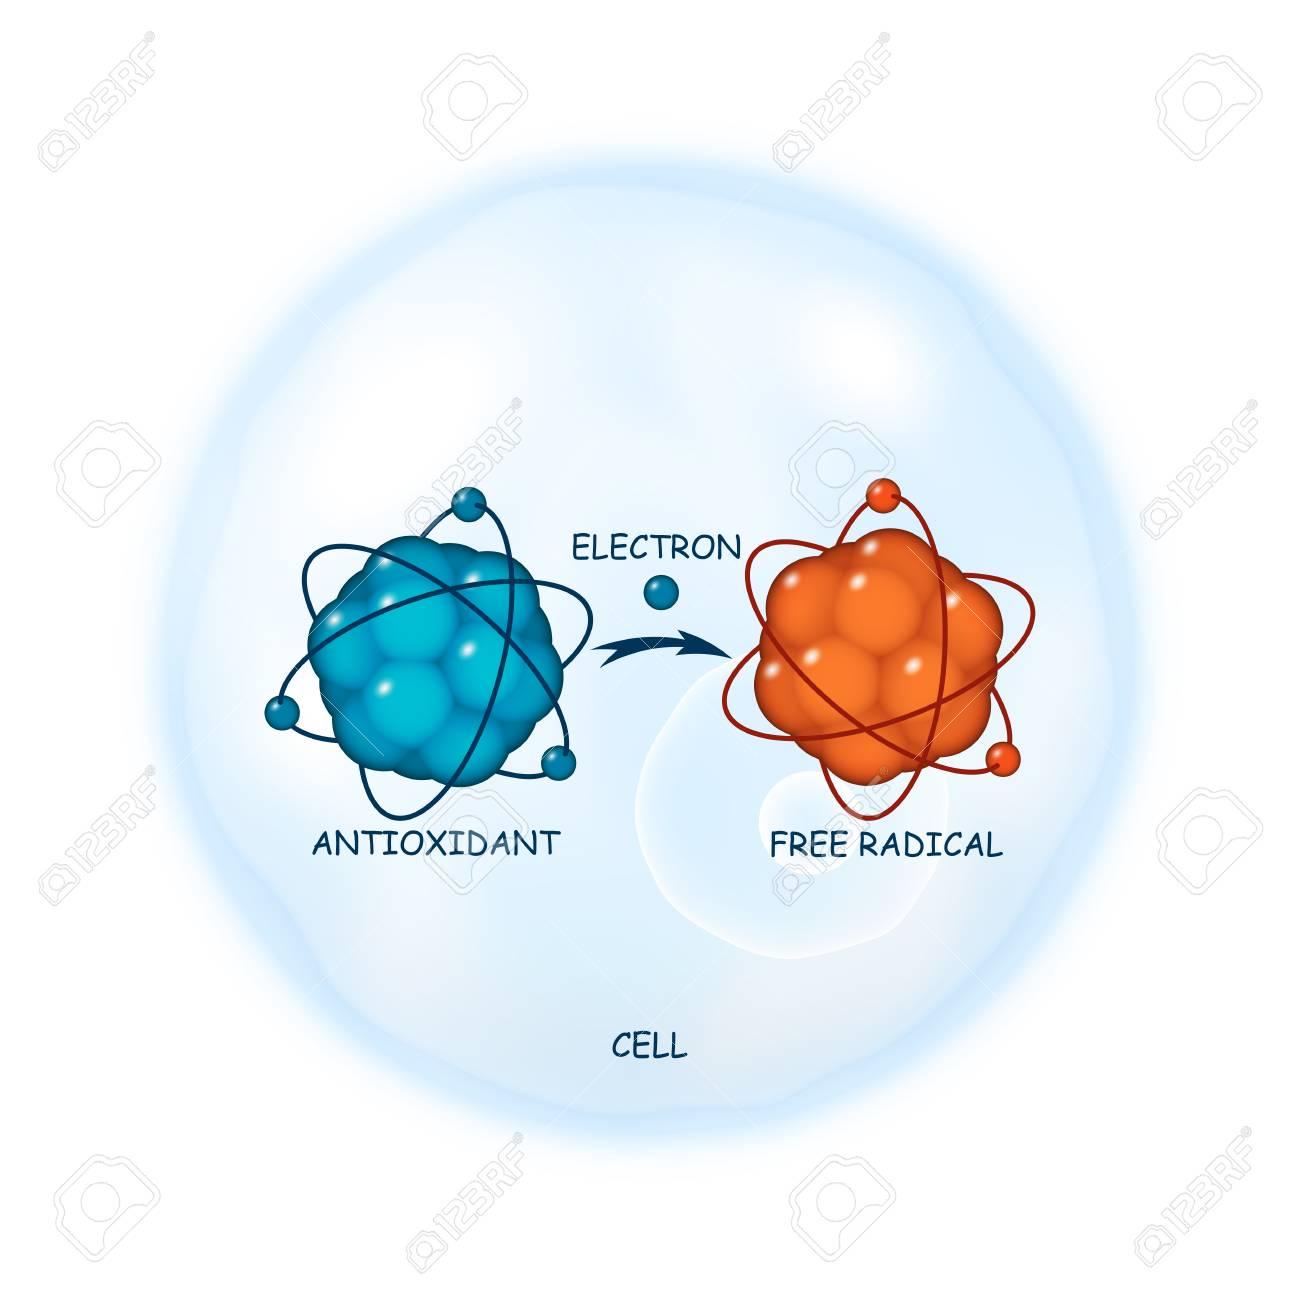 Antioxidant working principle abstract illustration - 97416334